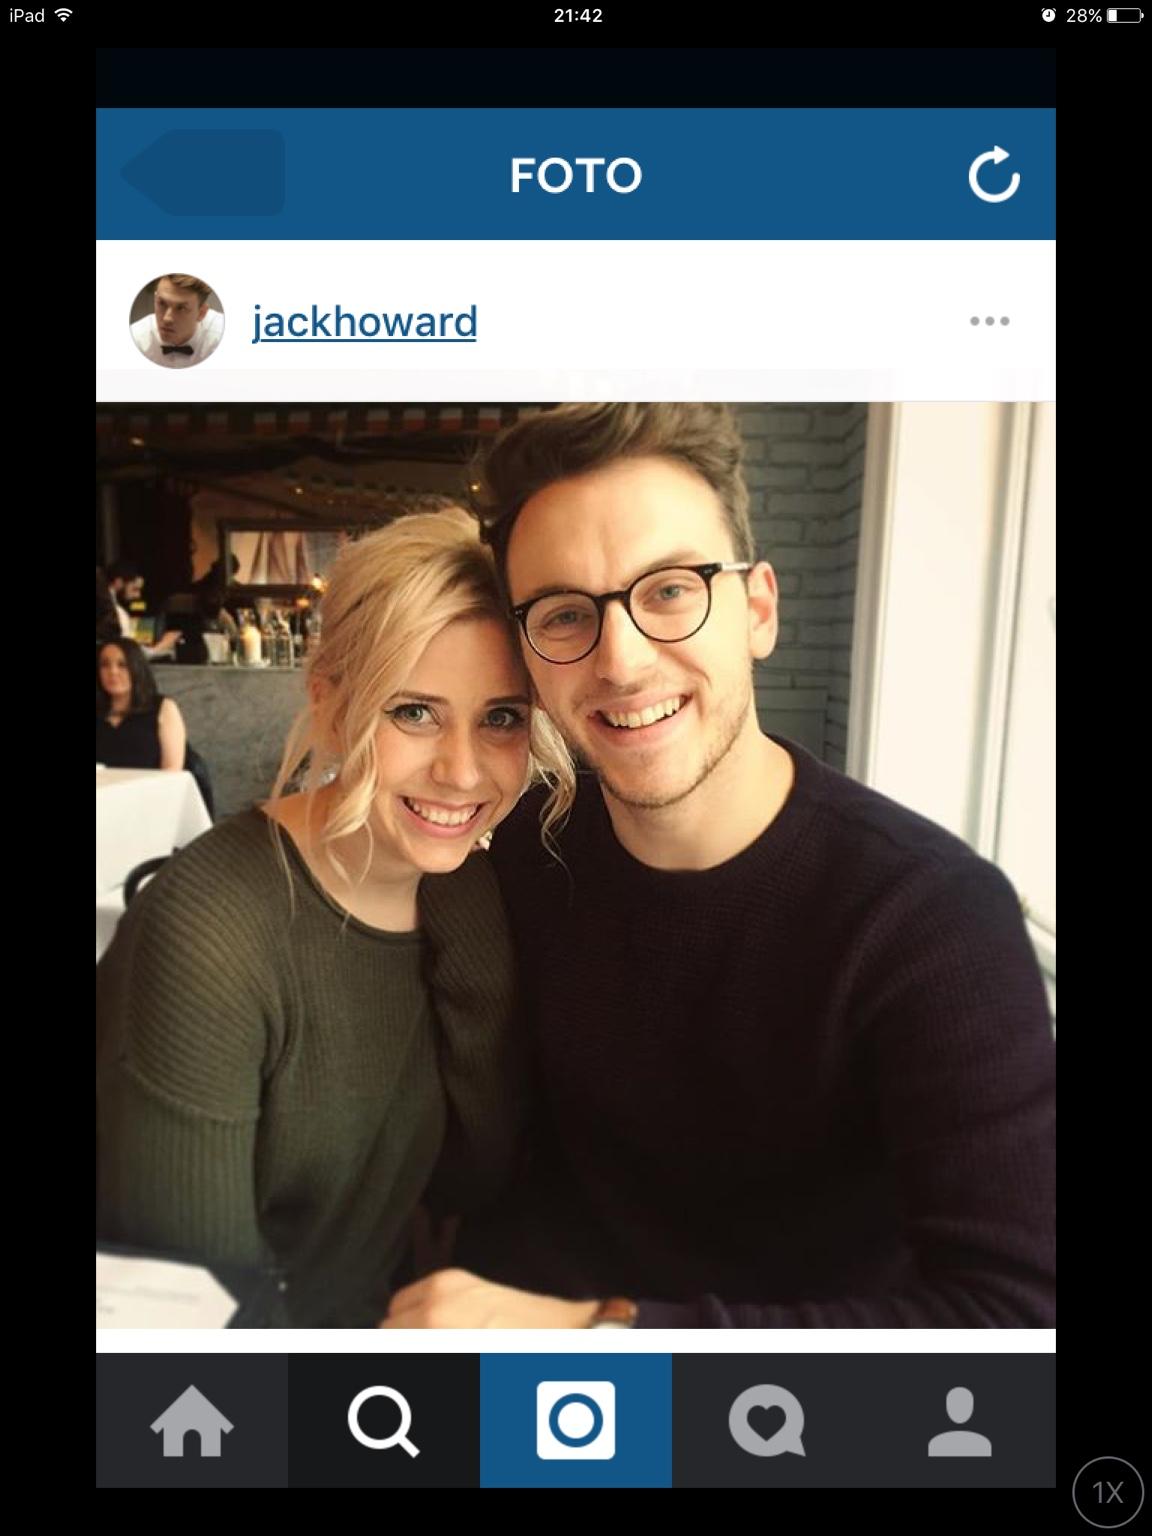 Jack howard and hazel hayes dating